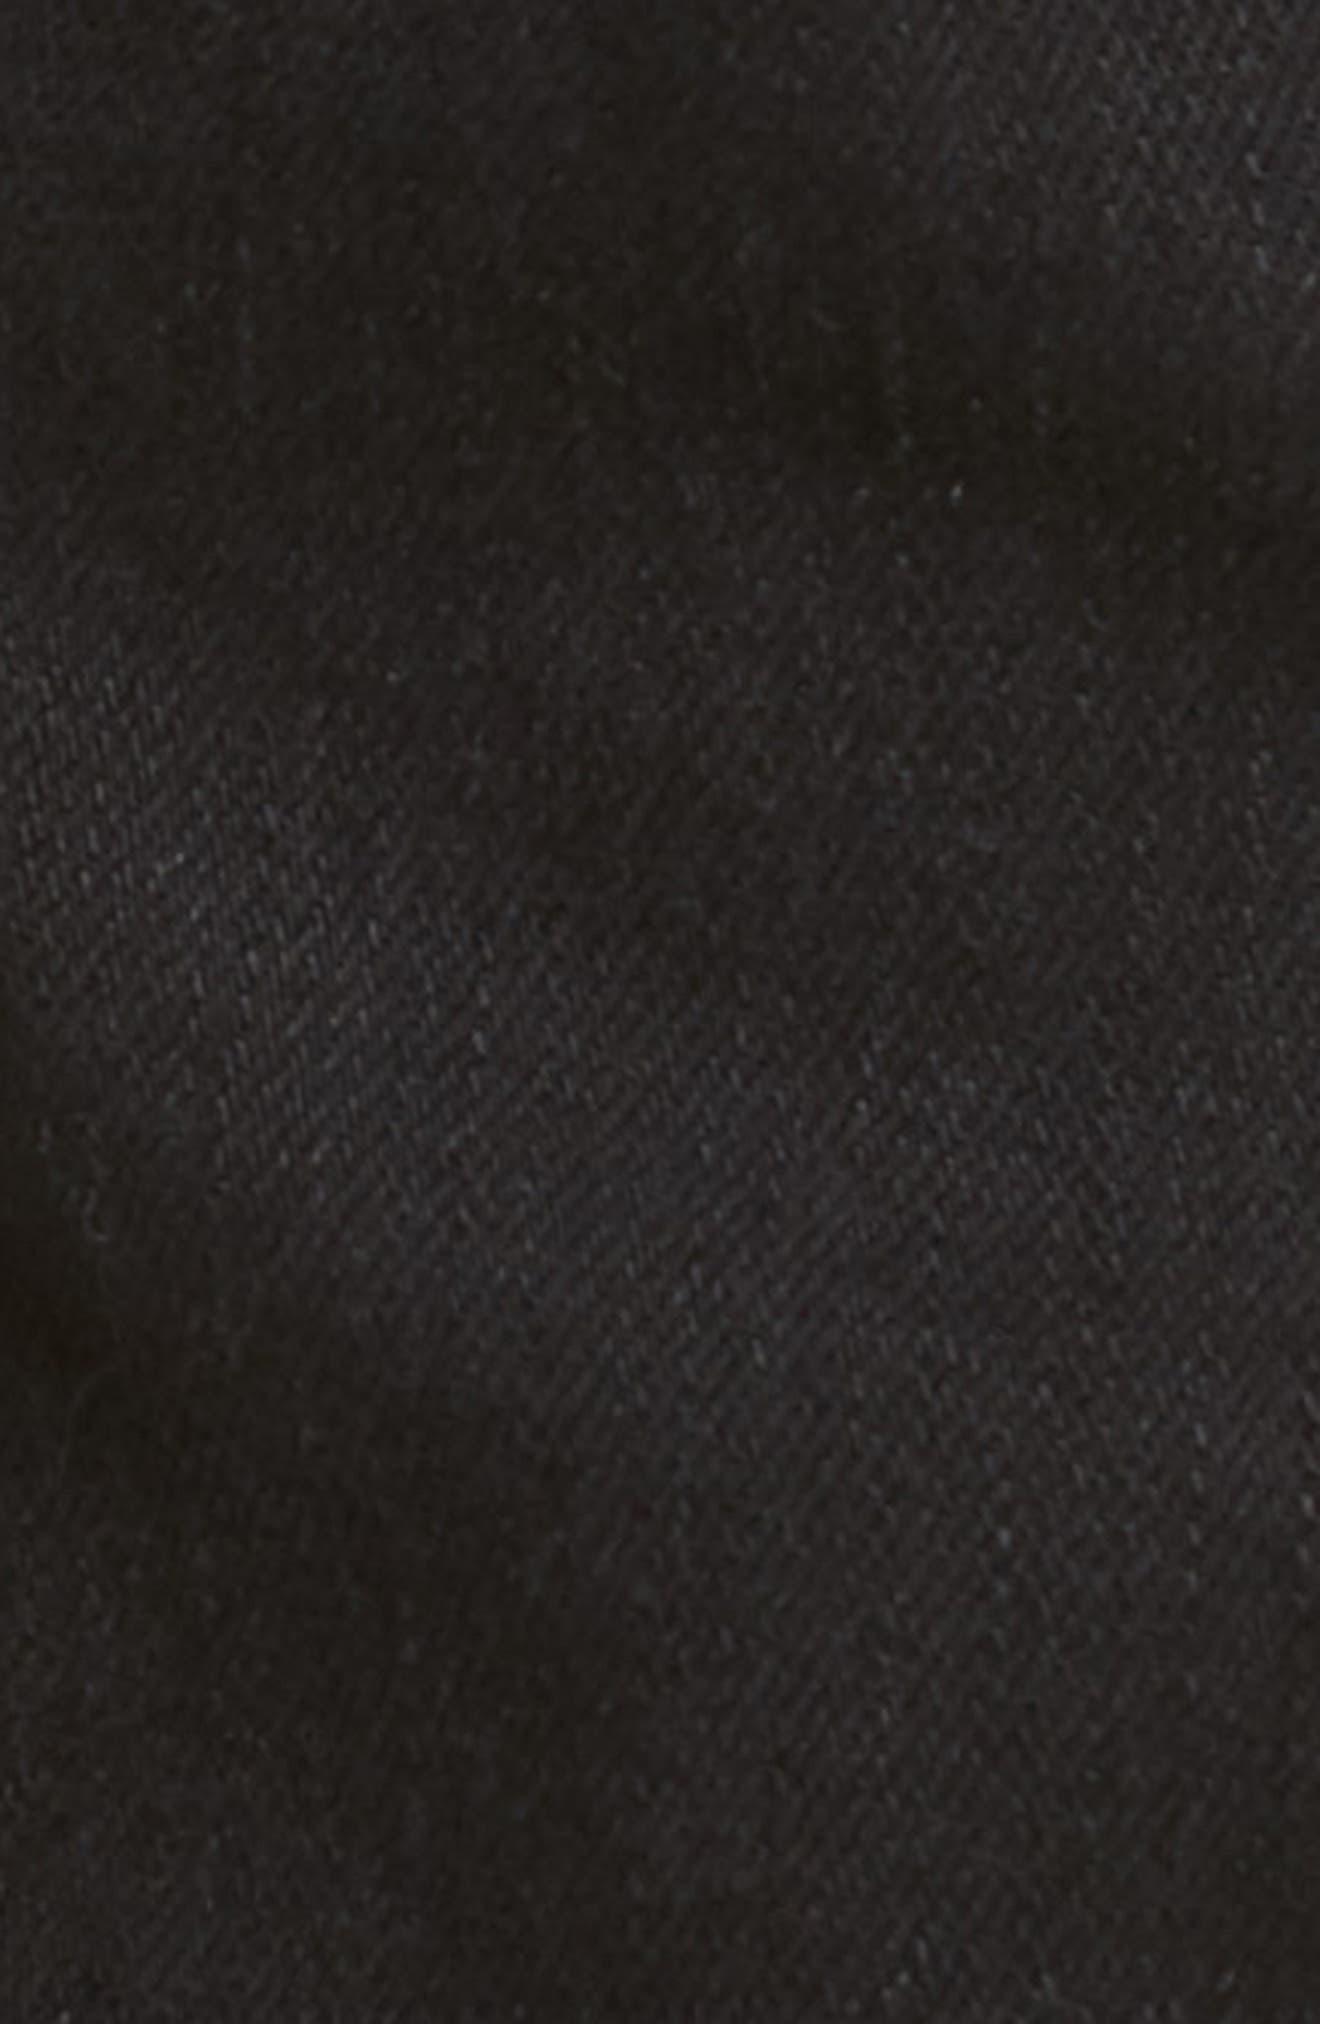 Rocco Skinny Fit Jeans,                             Alternate thumbnail 5, color,                             EQYD DARK STREET